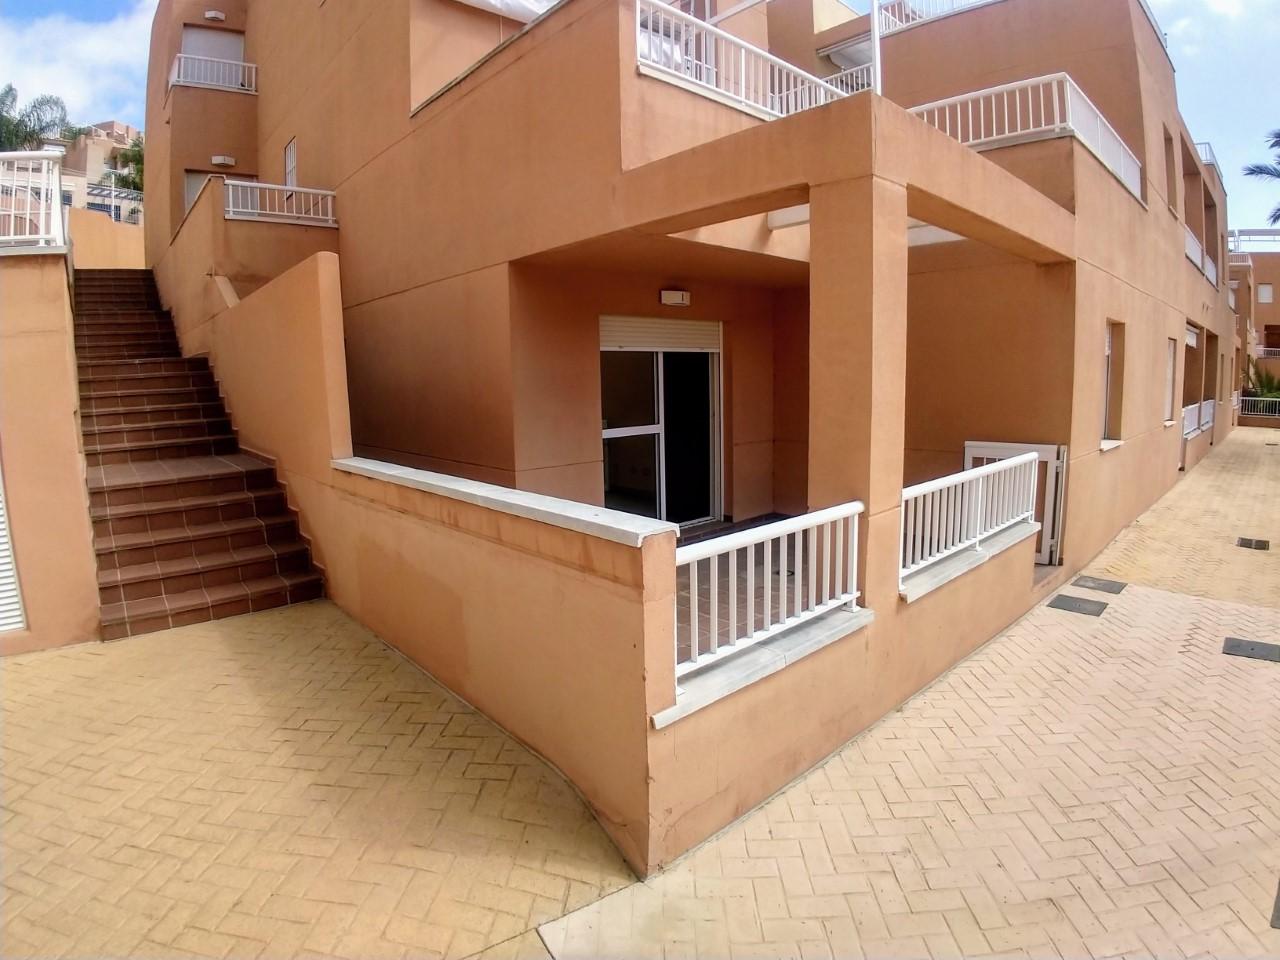 mp1149-Large new ground floor apartment.